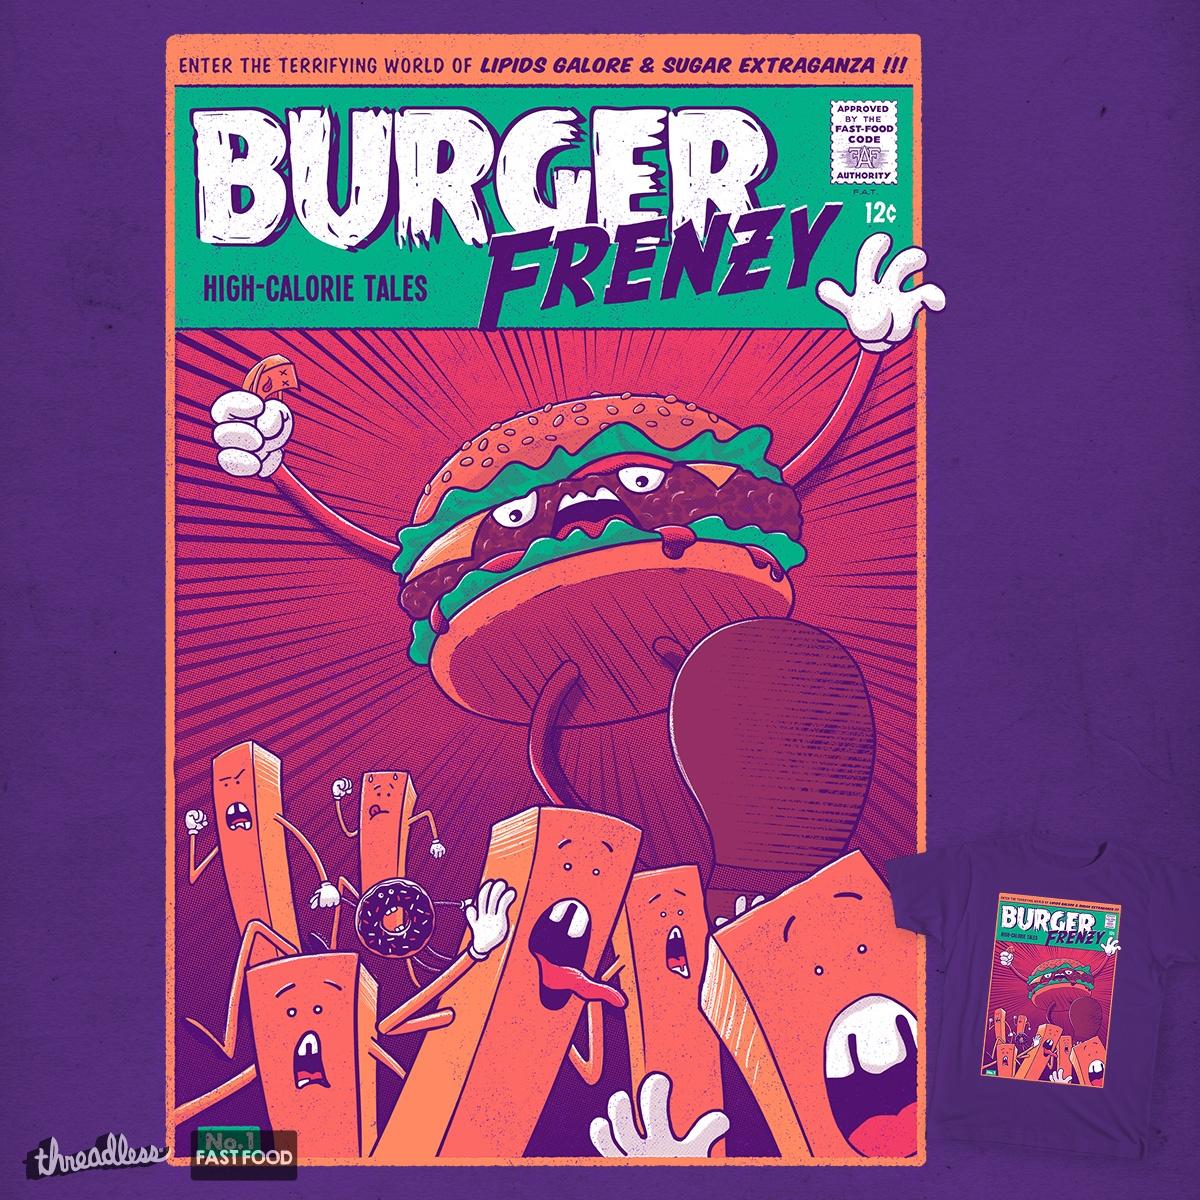 Burger Frenzy by v_calahan on Threadless